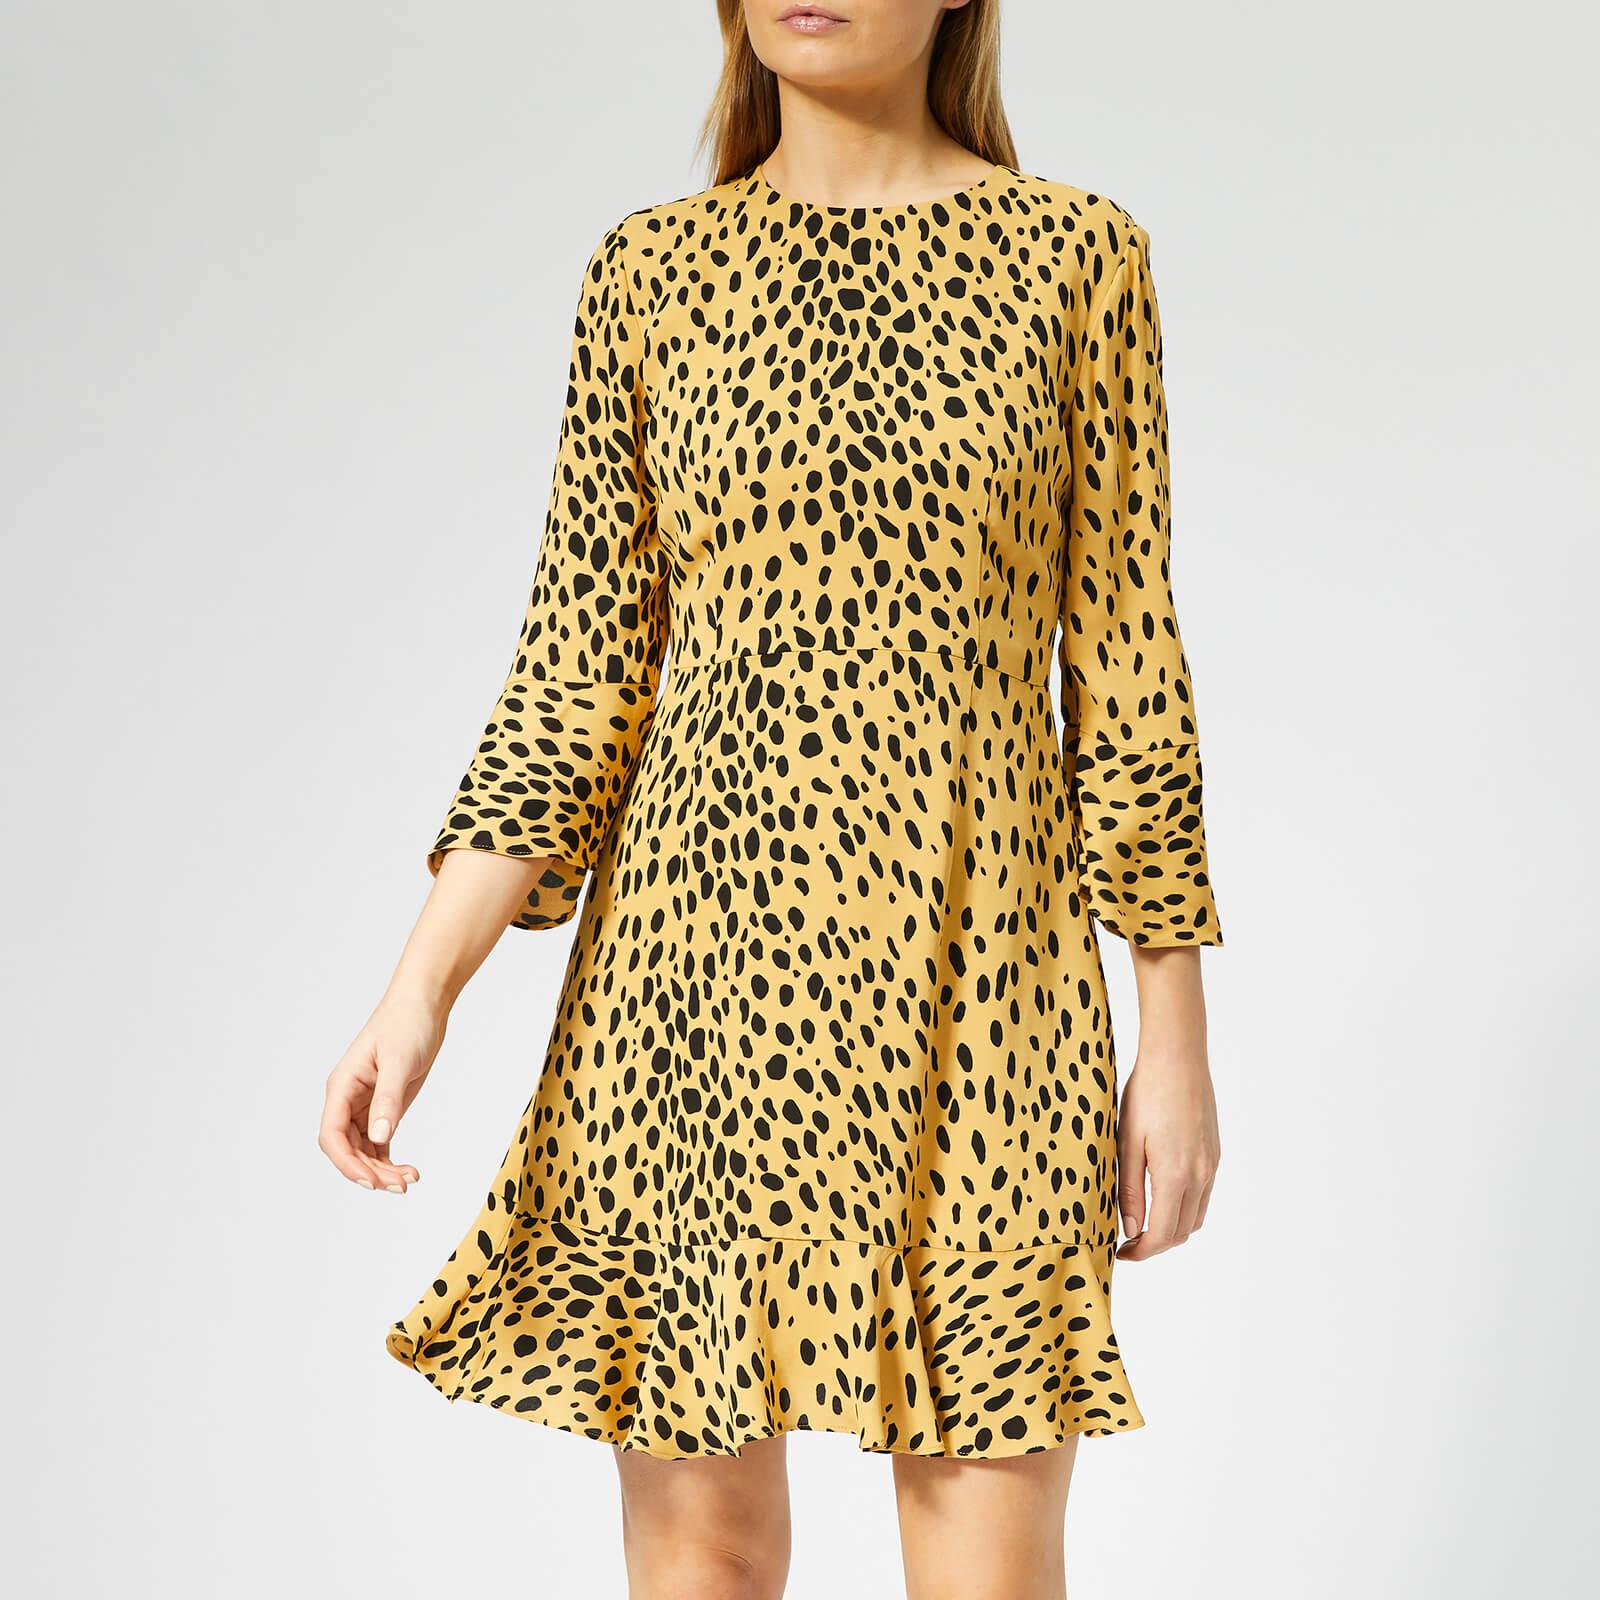 Whistles Women's Animal Print Flippy Dress - Cream/Multi - UK 12 - Cream